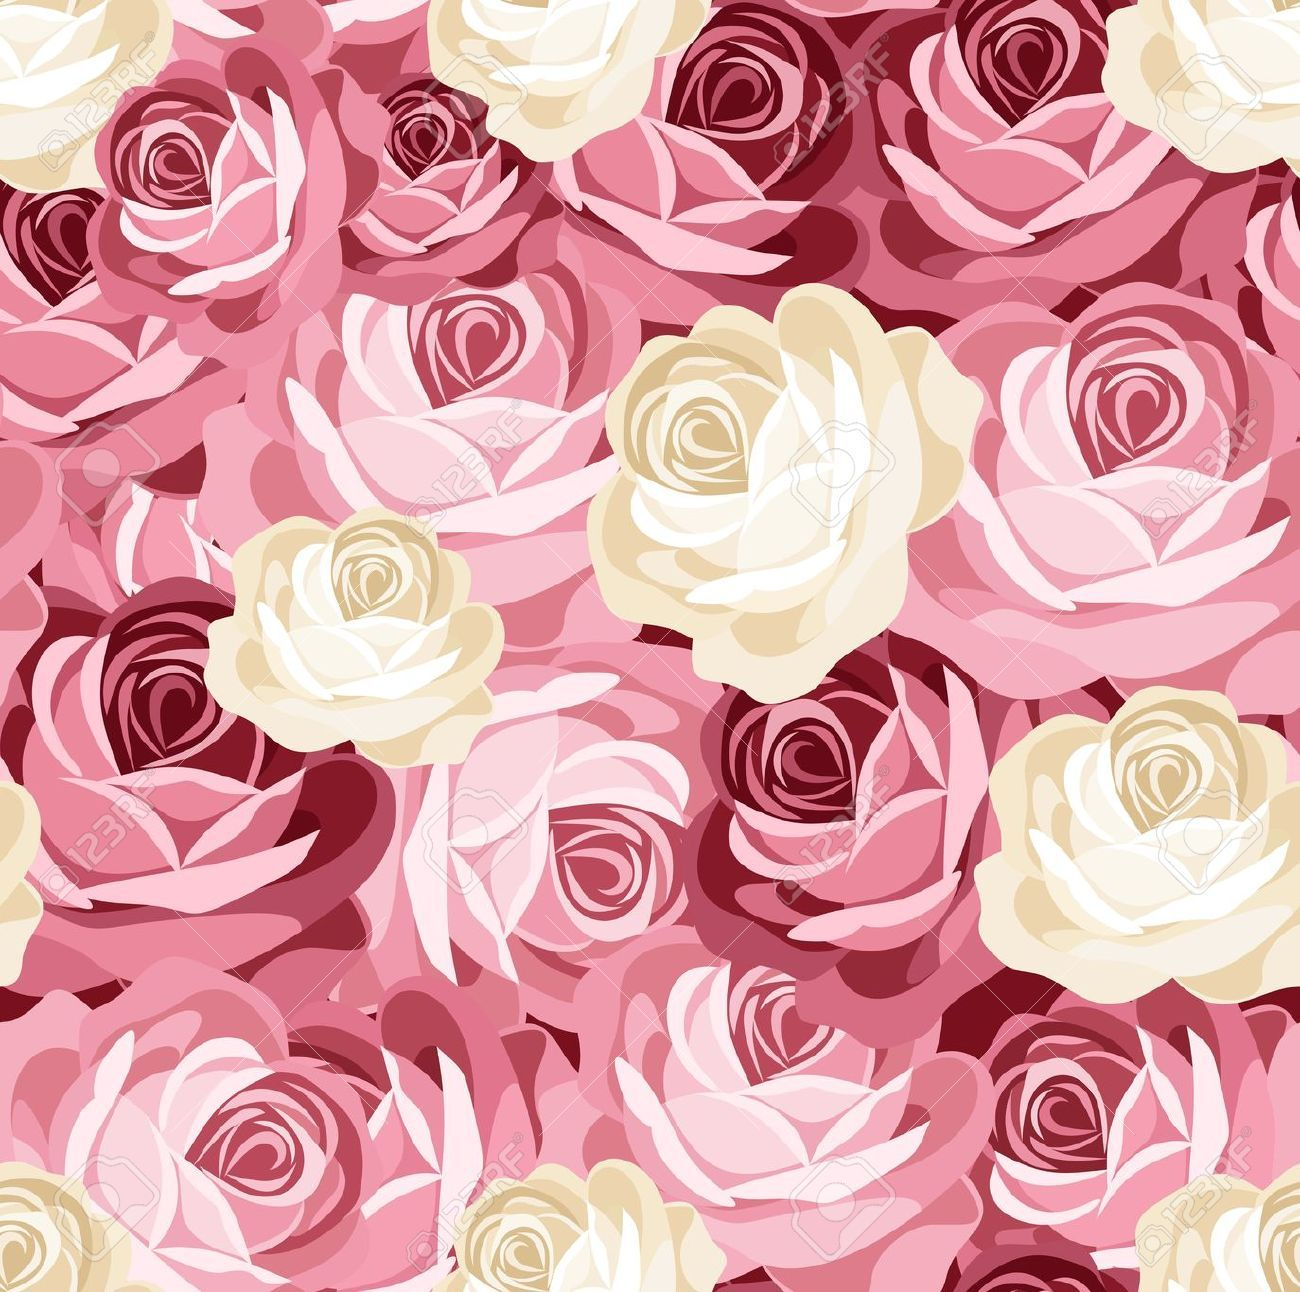 rosas rosa wallpaper - Pesquisa Google | фоны | Pinterest ...